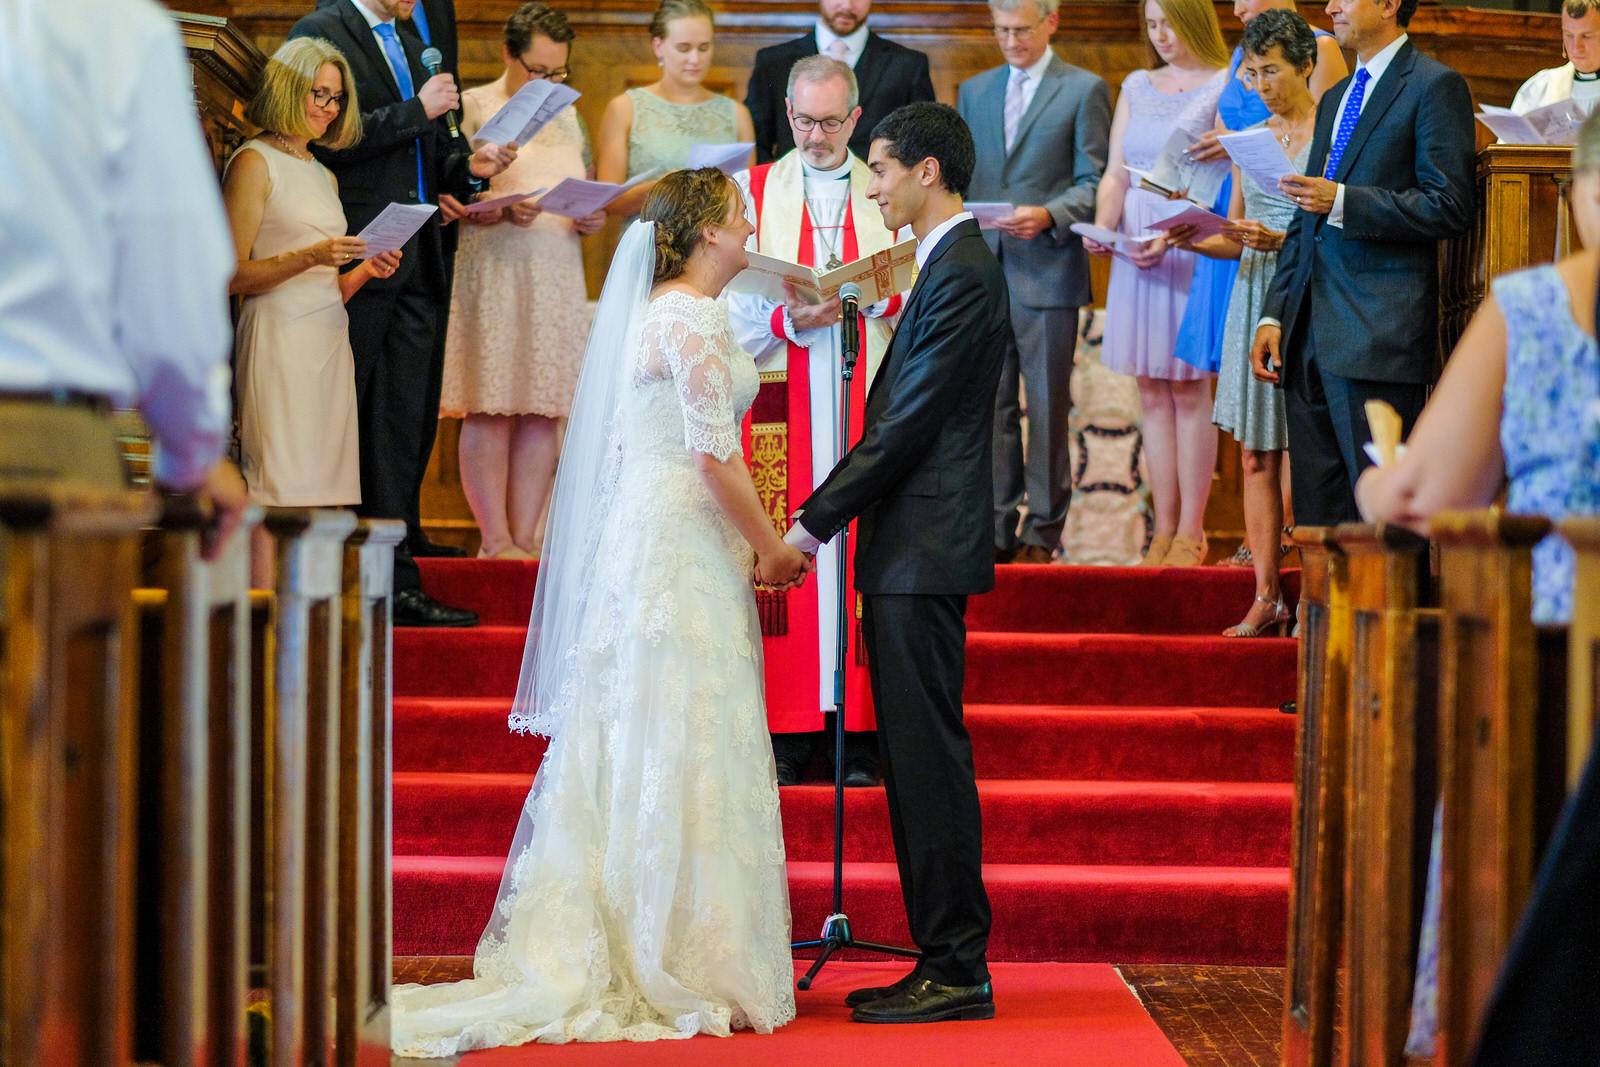 candid-vermont-wedding-photography-576.jpg